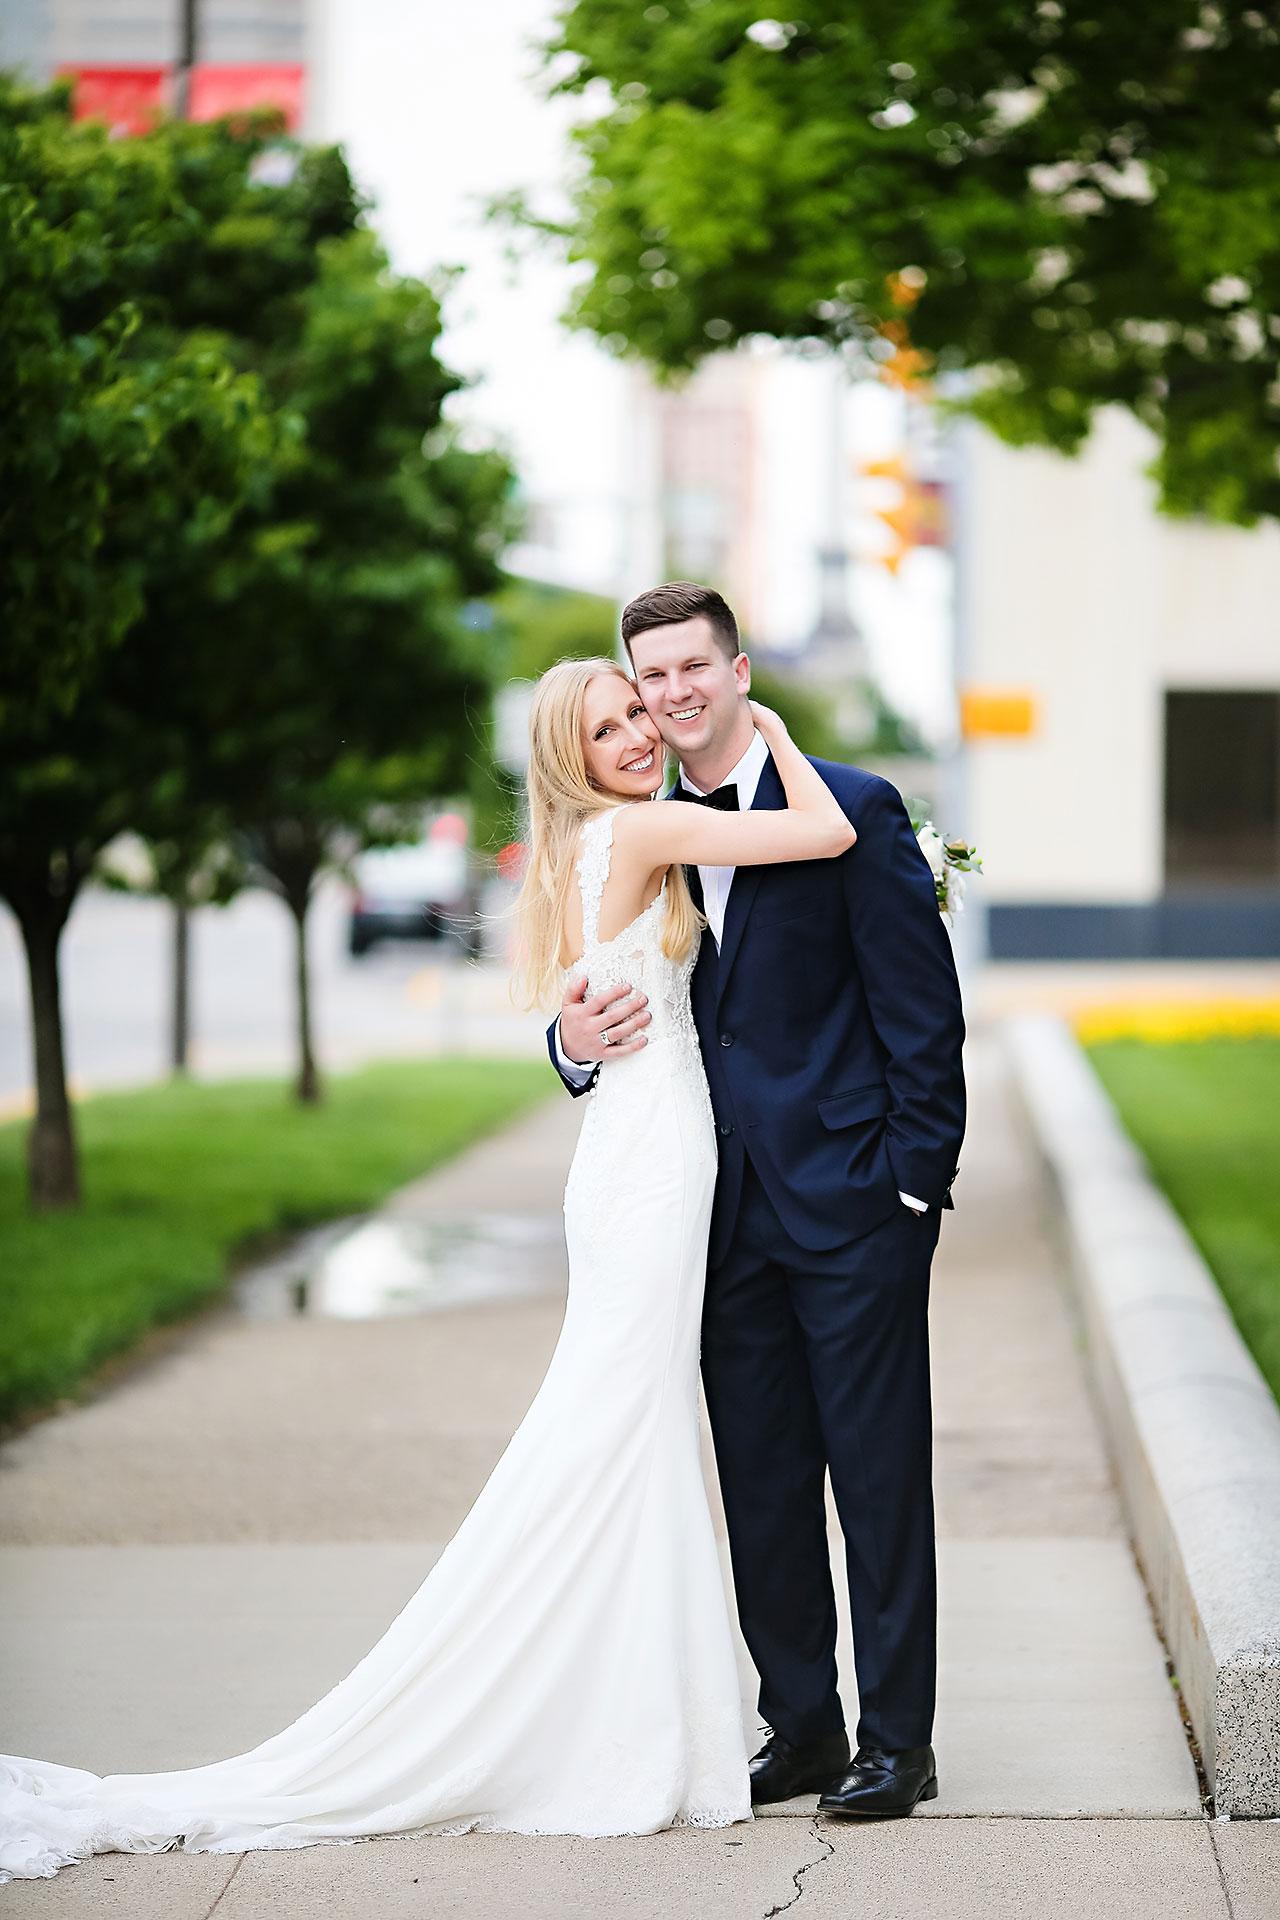 Molly Declan Scottish Rite Indianapolis Wedding 225